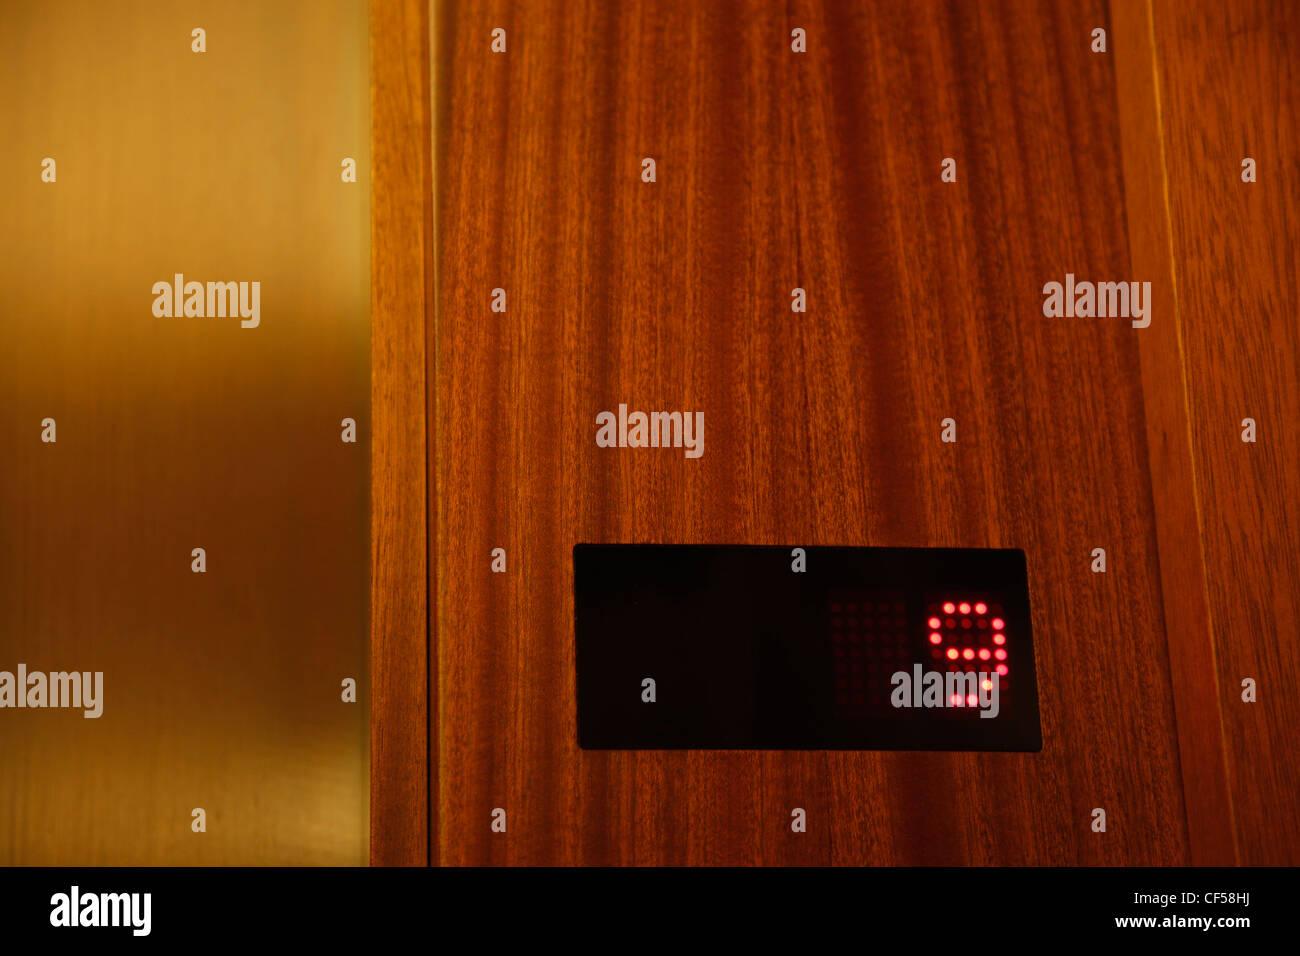 Germany, Berlin, Number 9 displaying in elevator - Stock Image